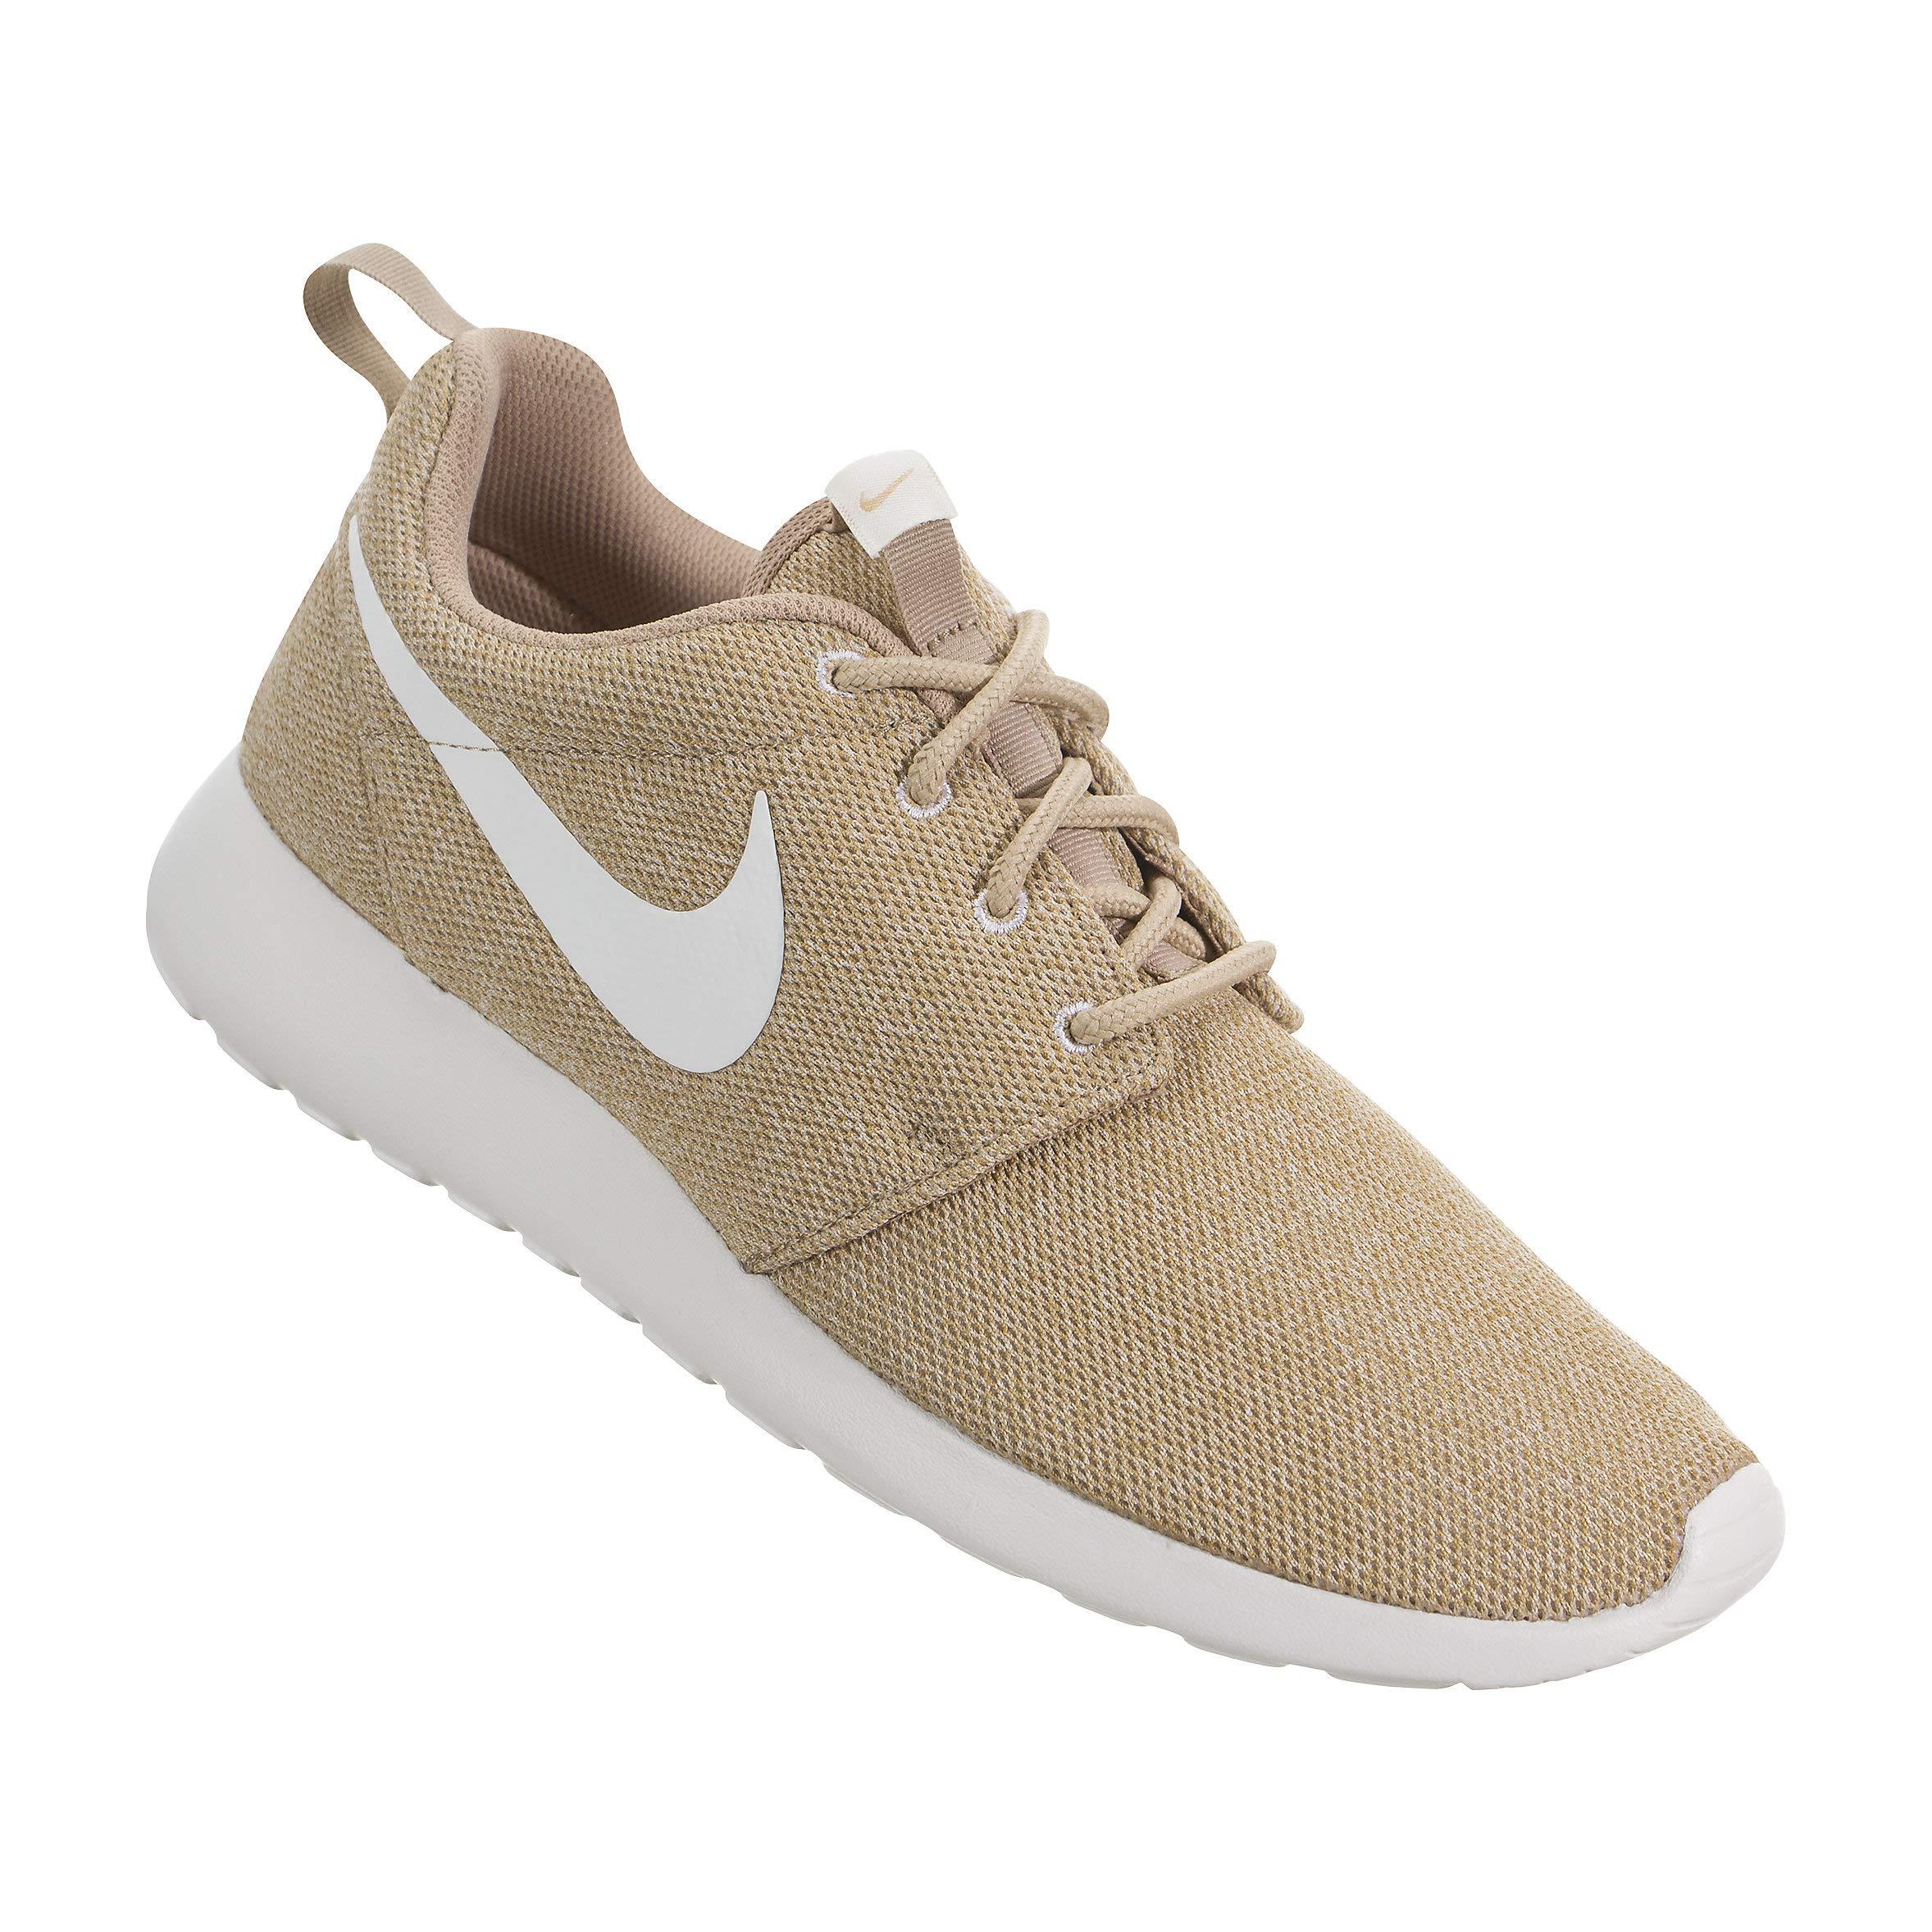 release date 3b3fe 36317 Nike Women s Roshe One